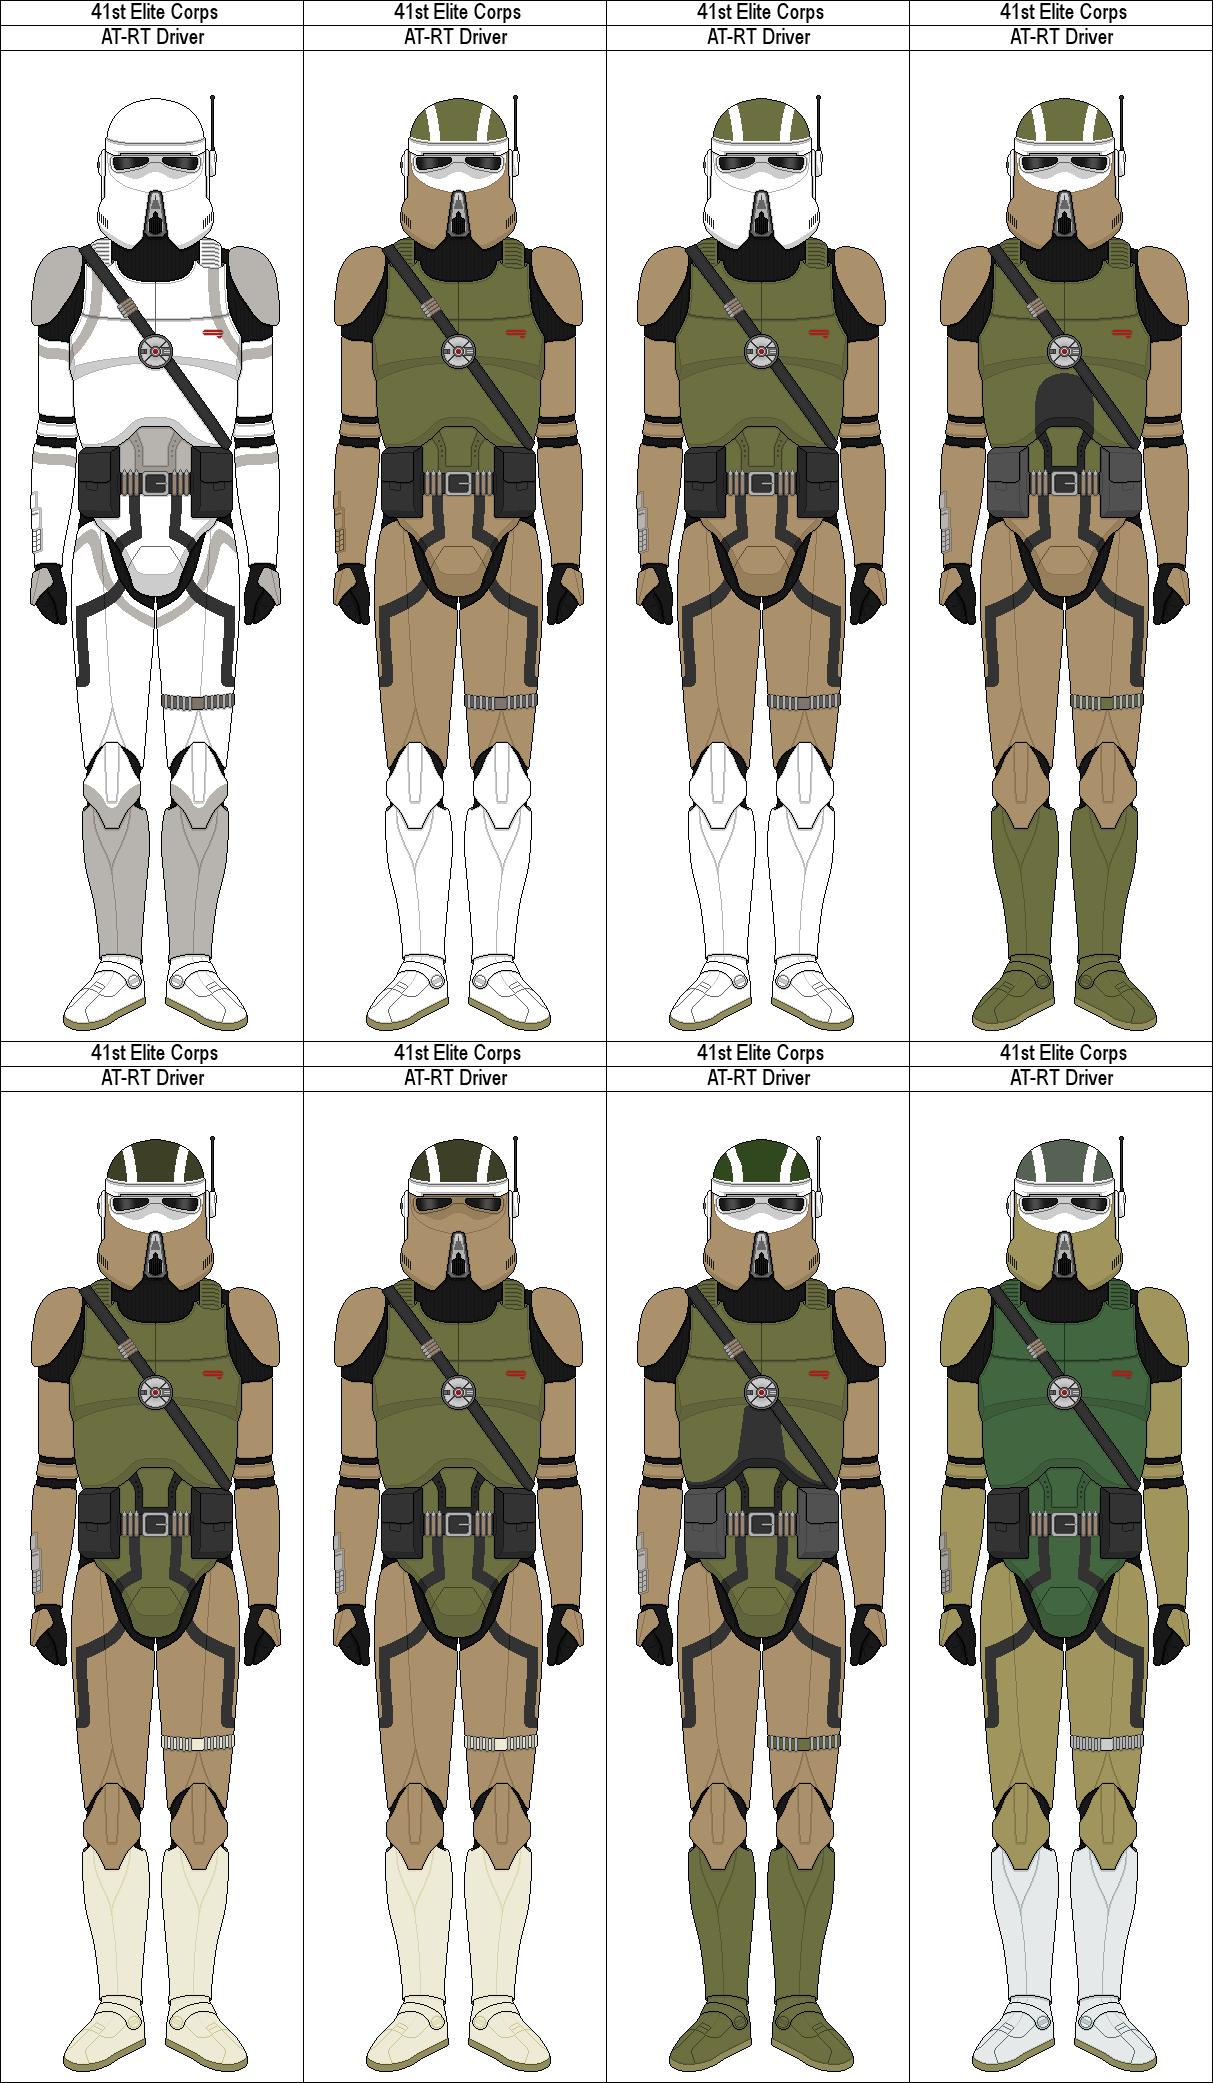 41 Elite 41st elite corps at-rt driversmarcusstarkiller on deviantart